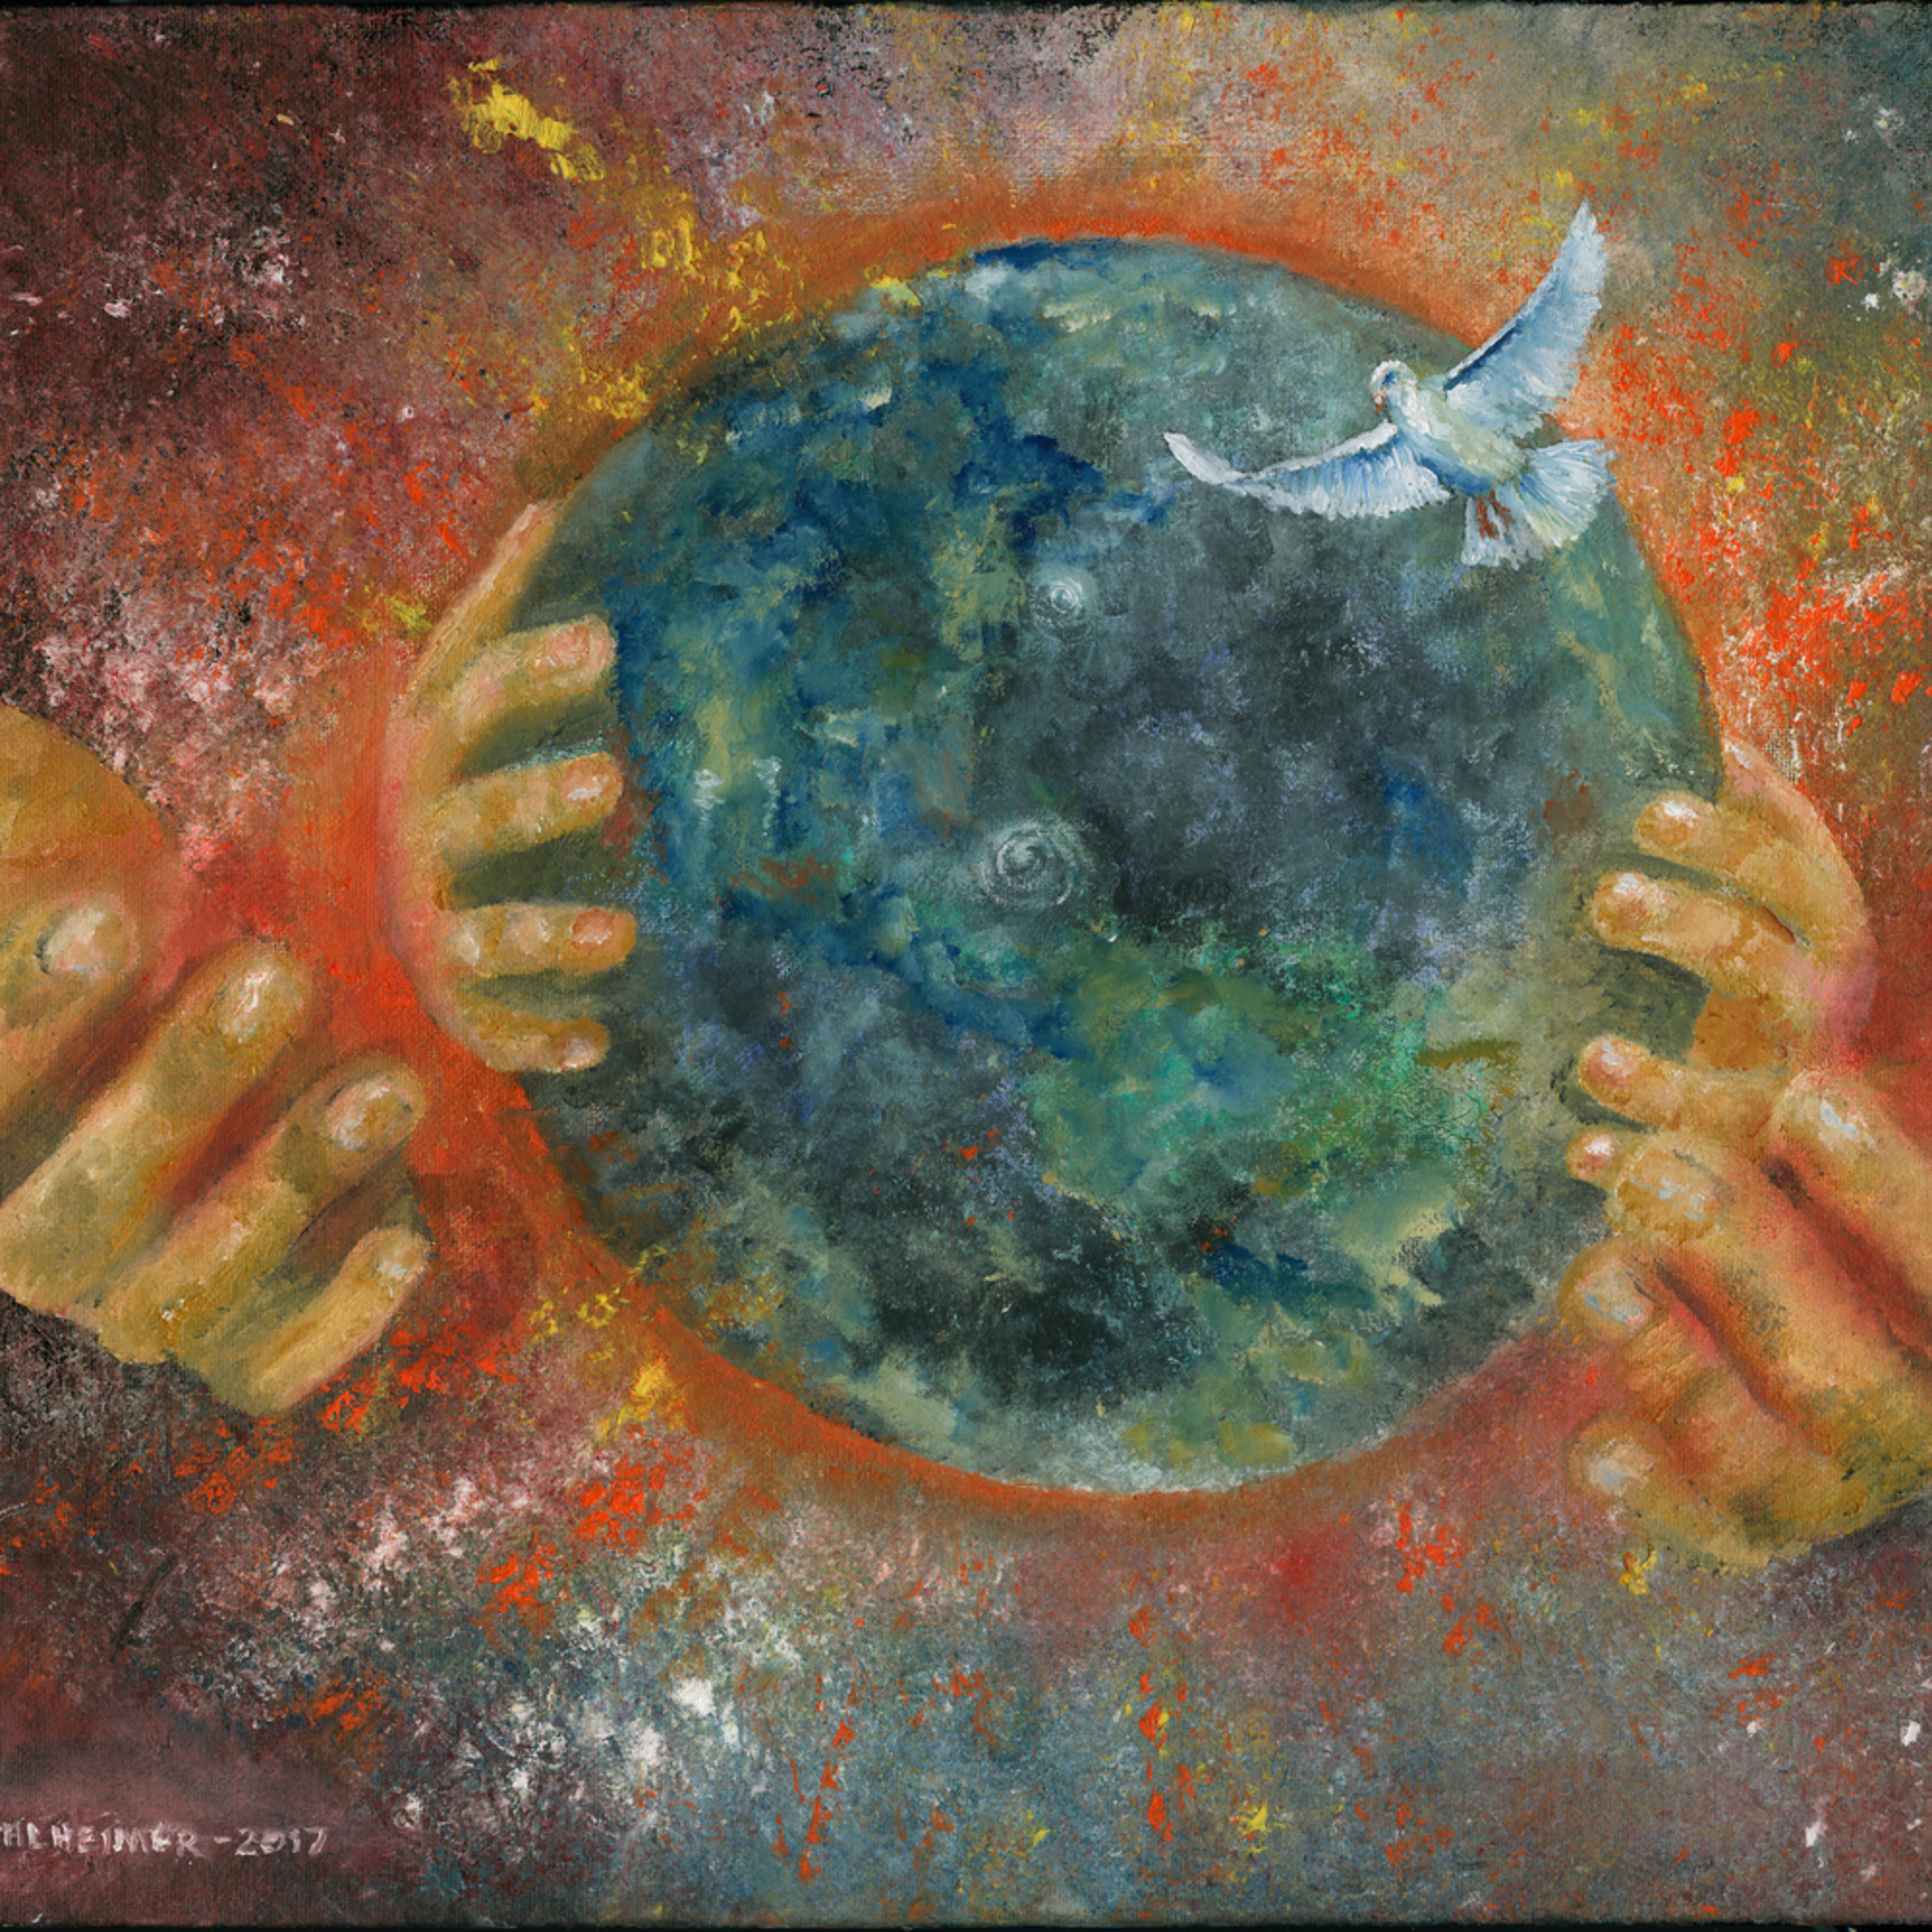 His hands by denise dahlheimer view 1 clnmv5